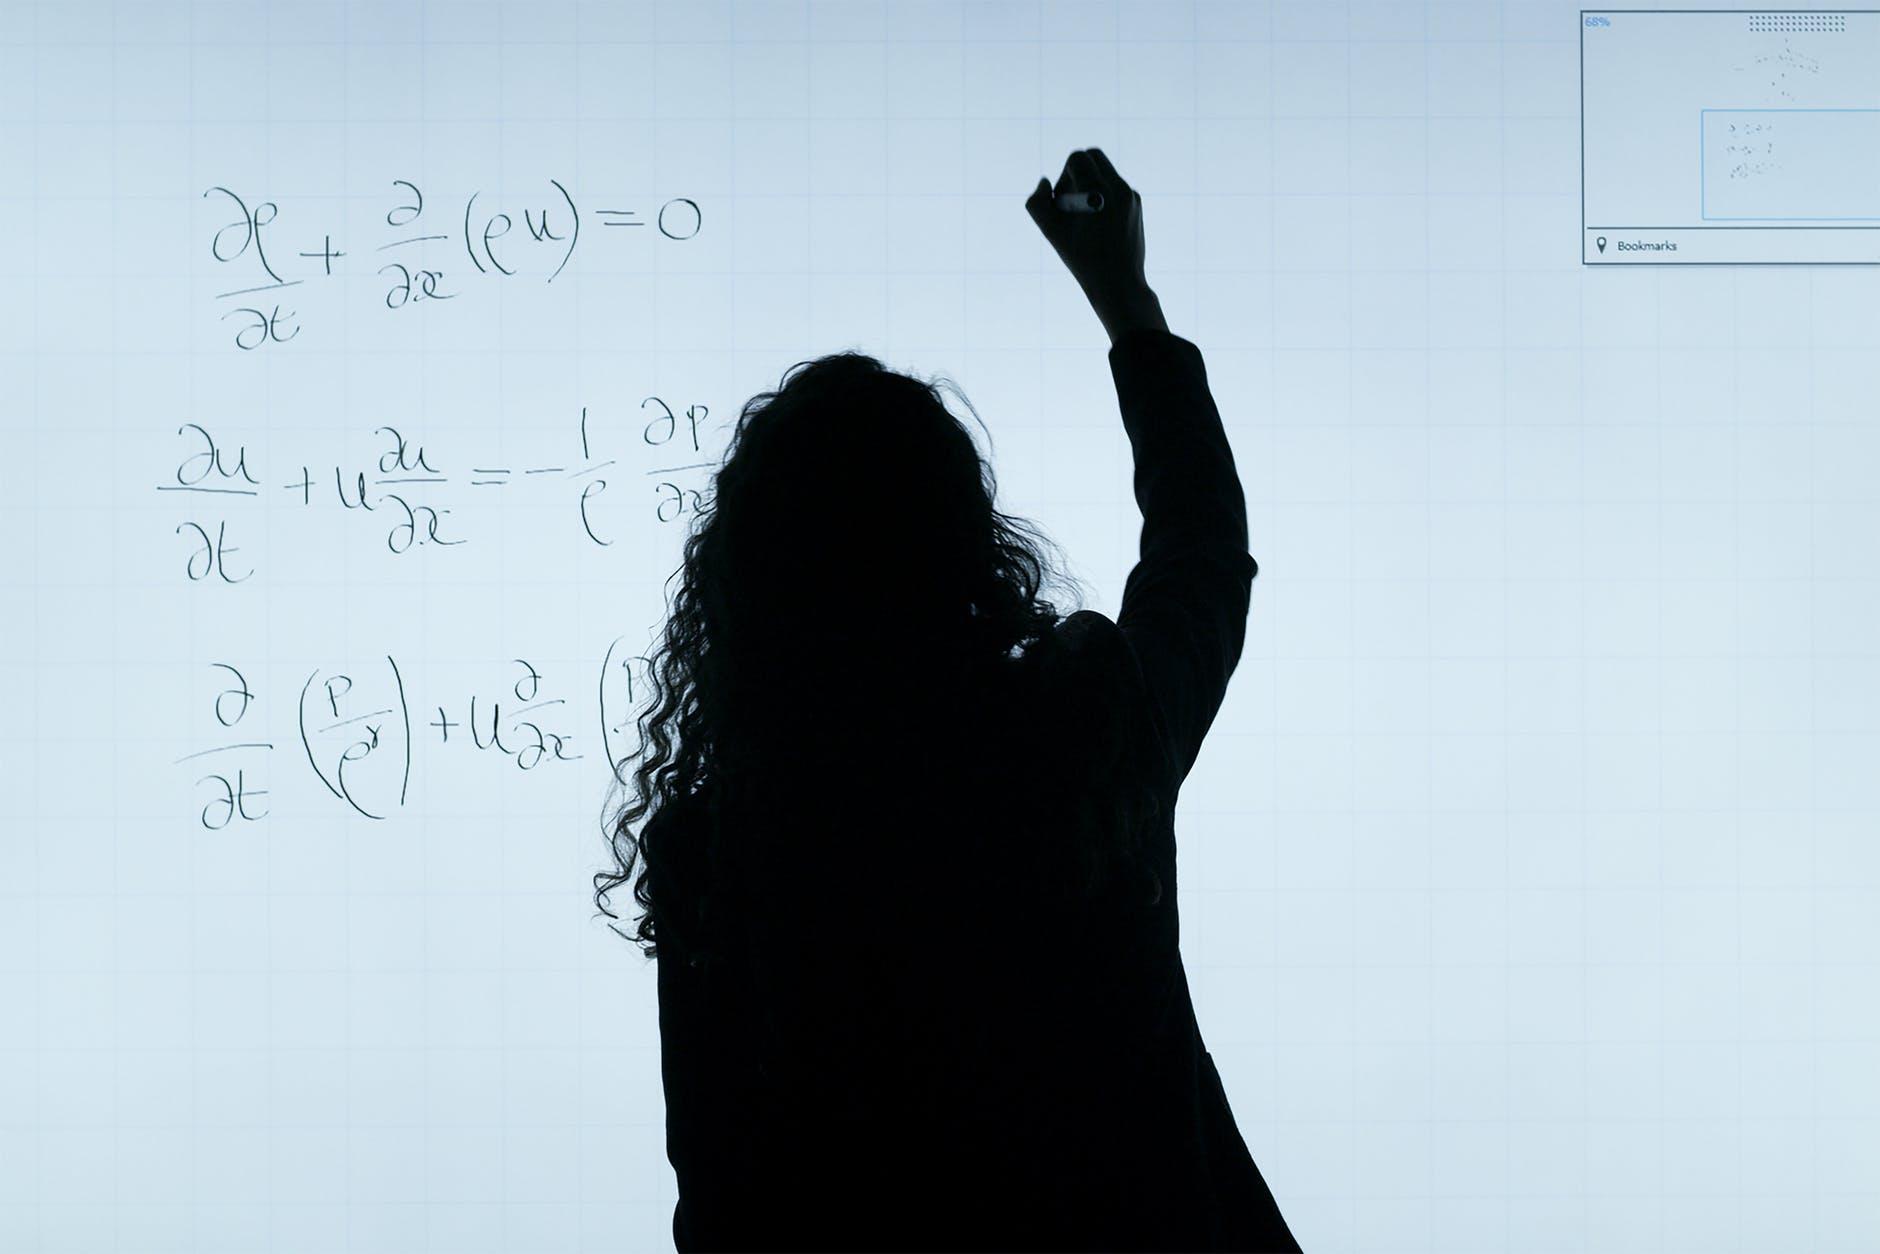 woman writing on a whiteboard